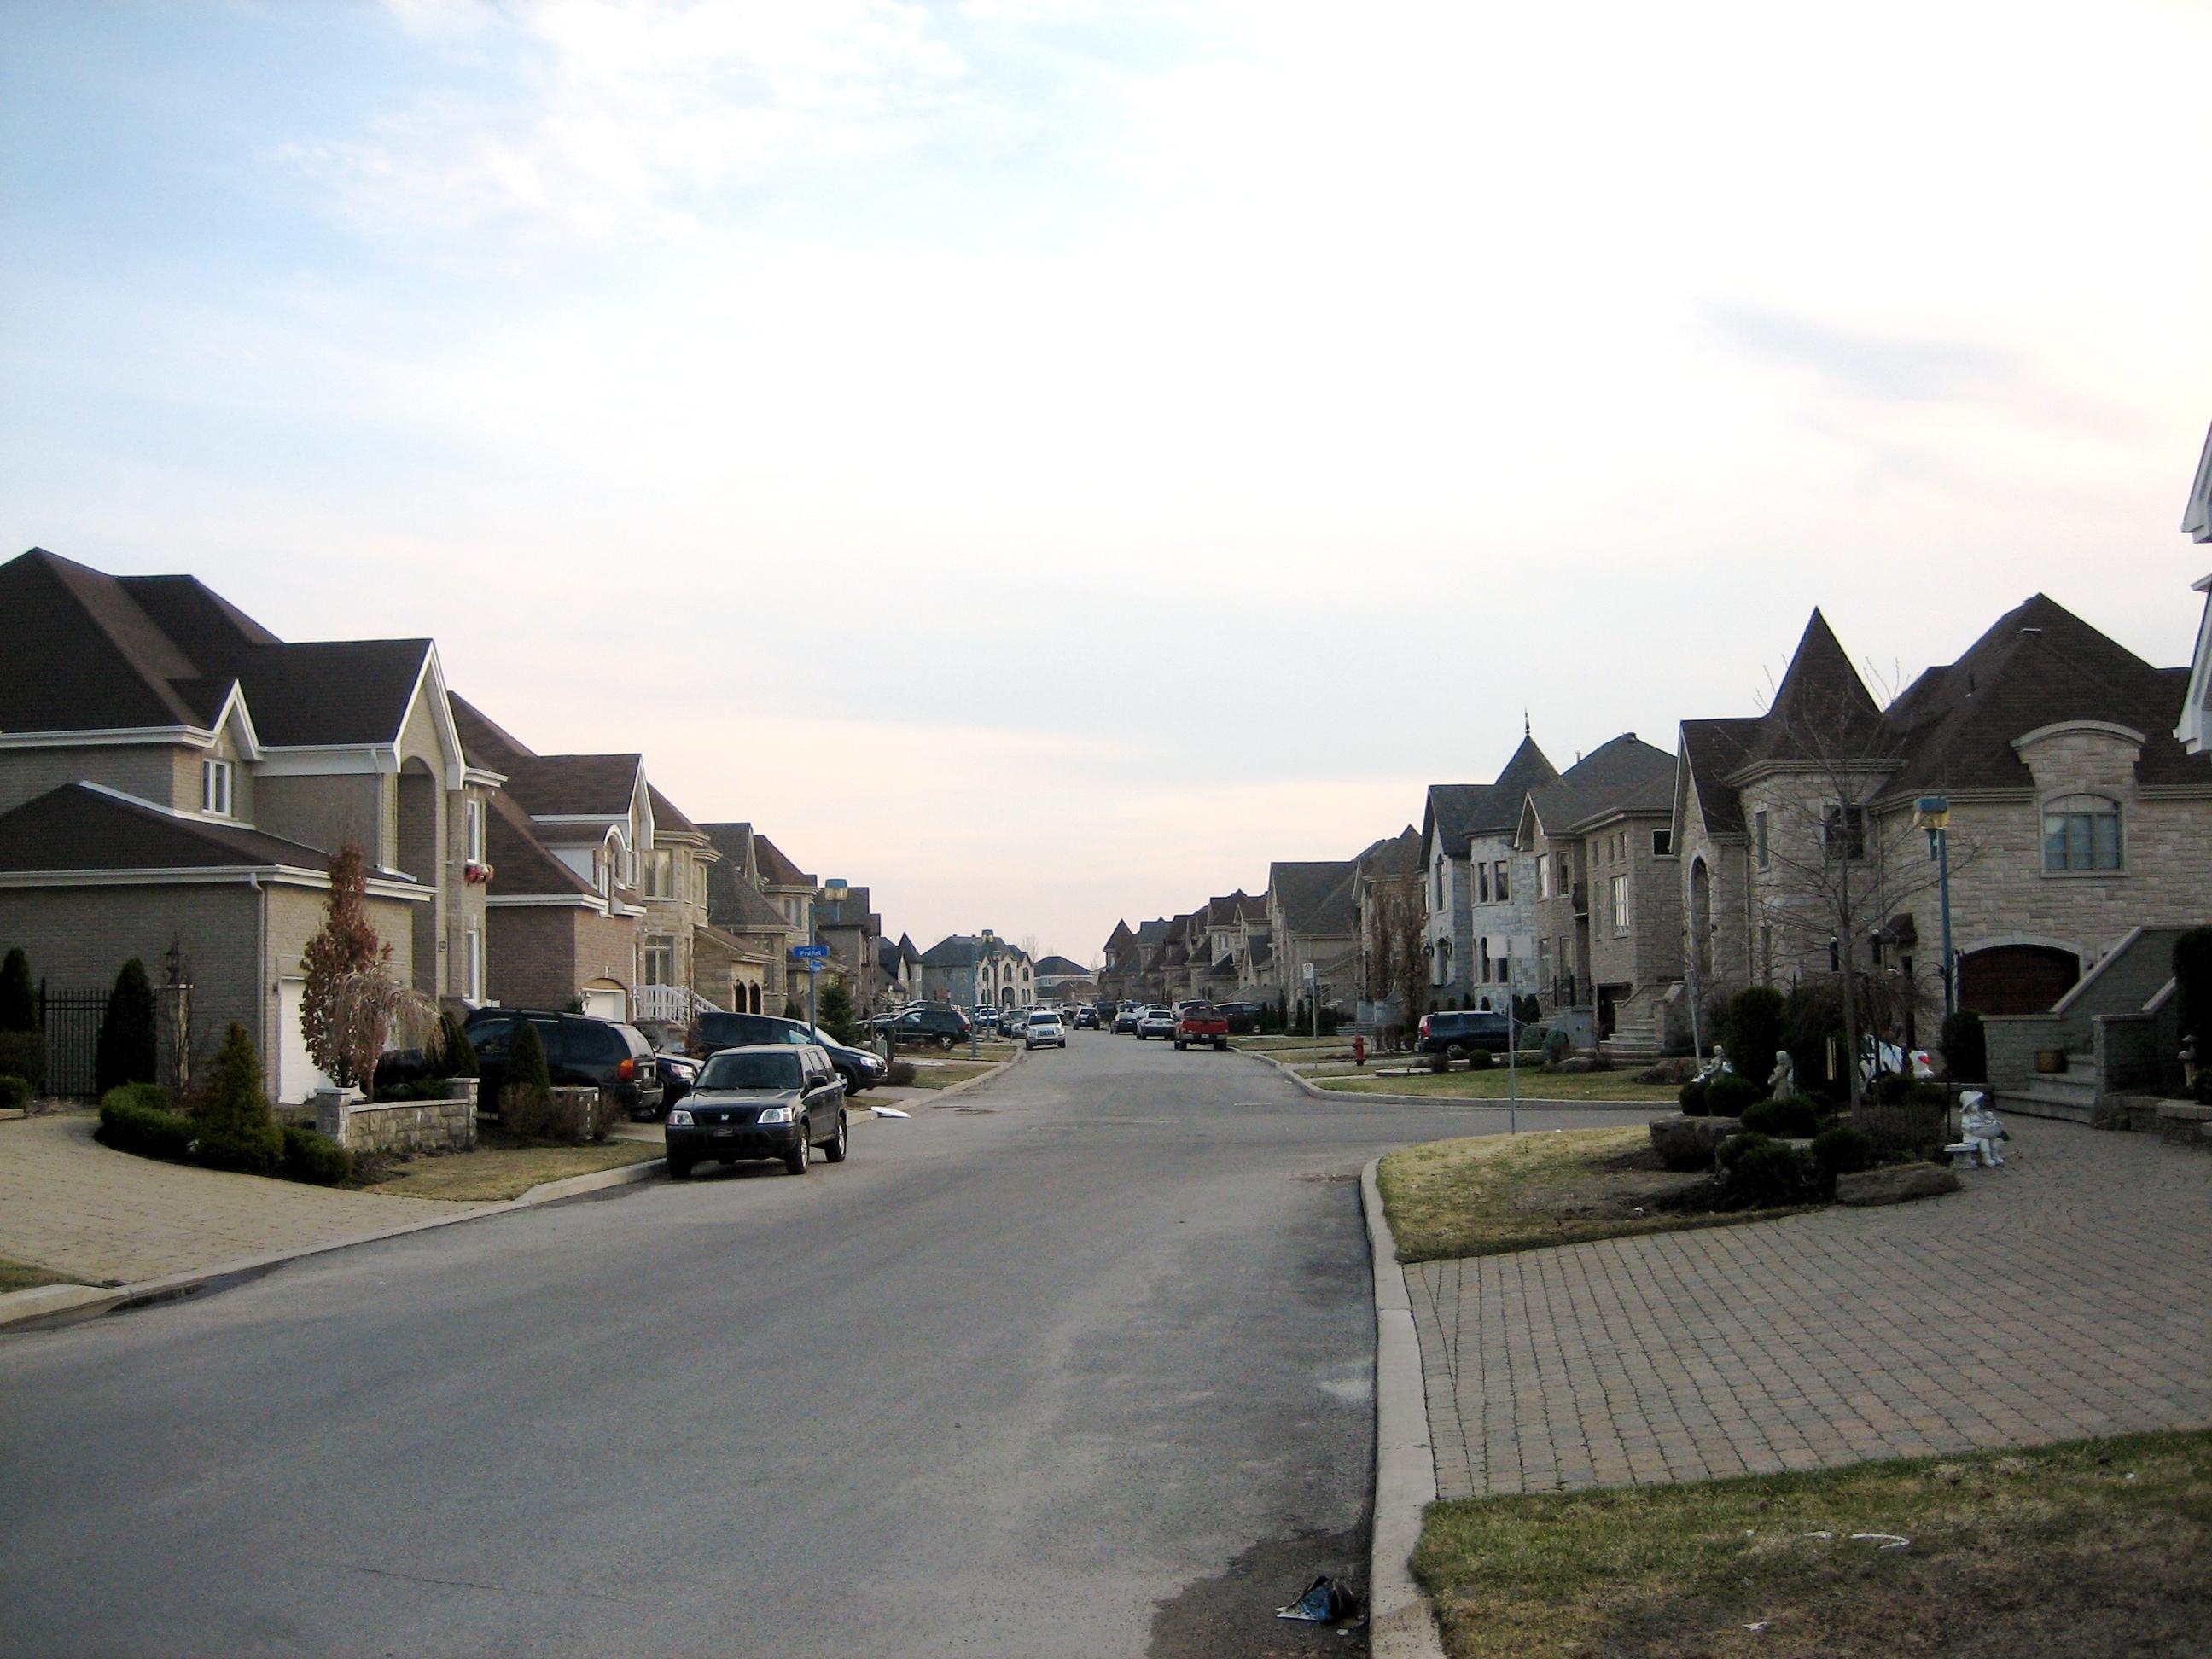 A street of lookalike houses